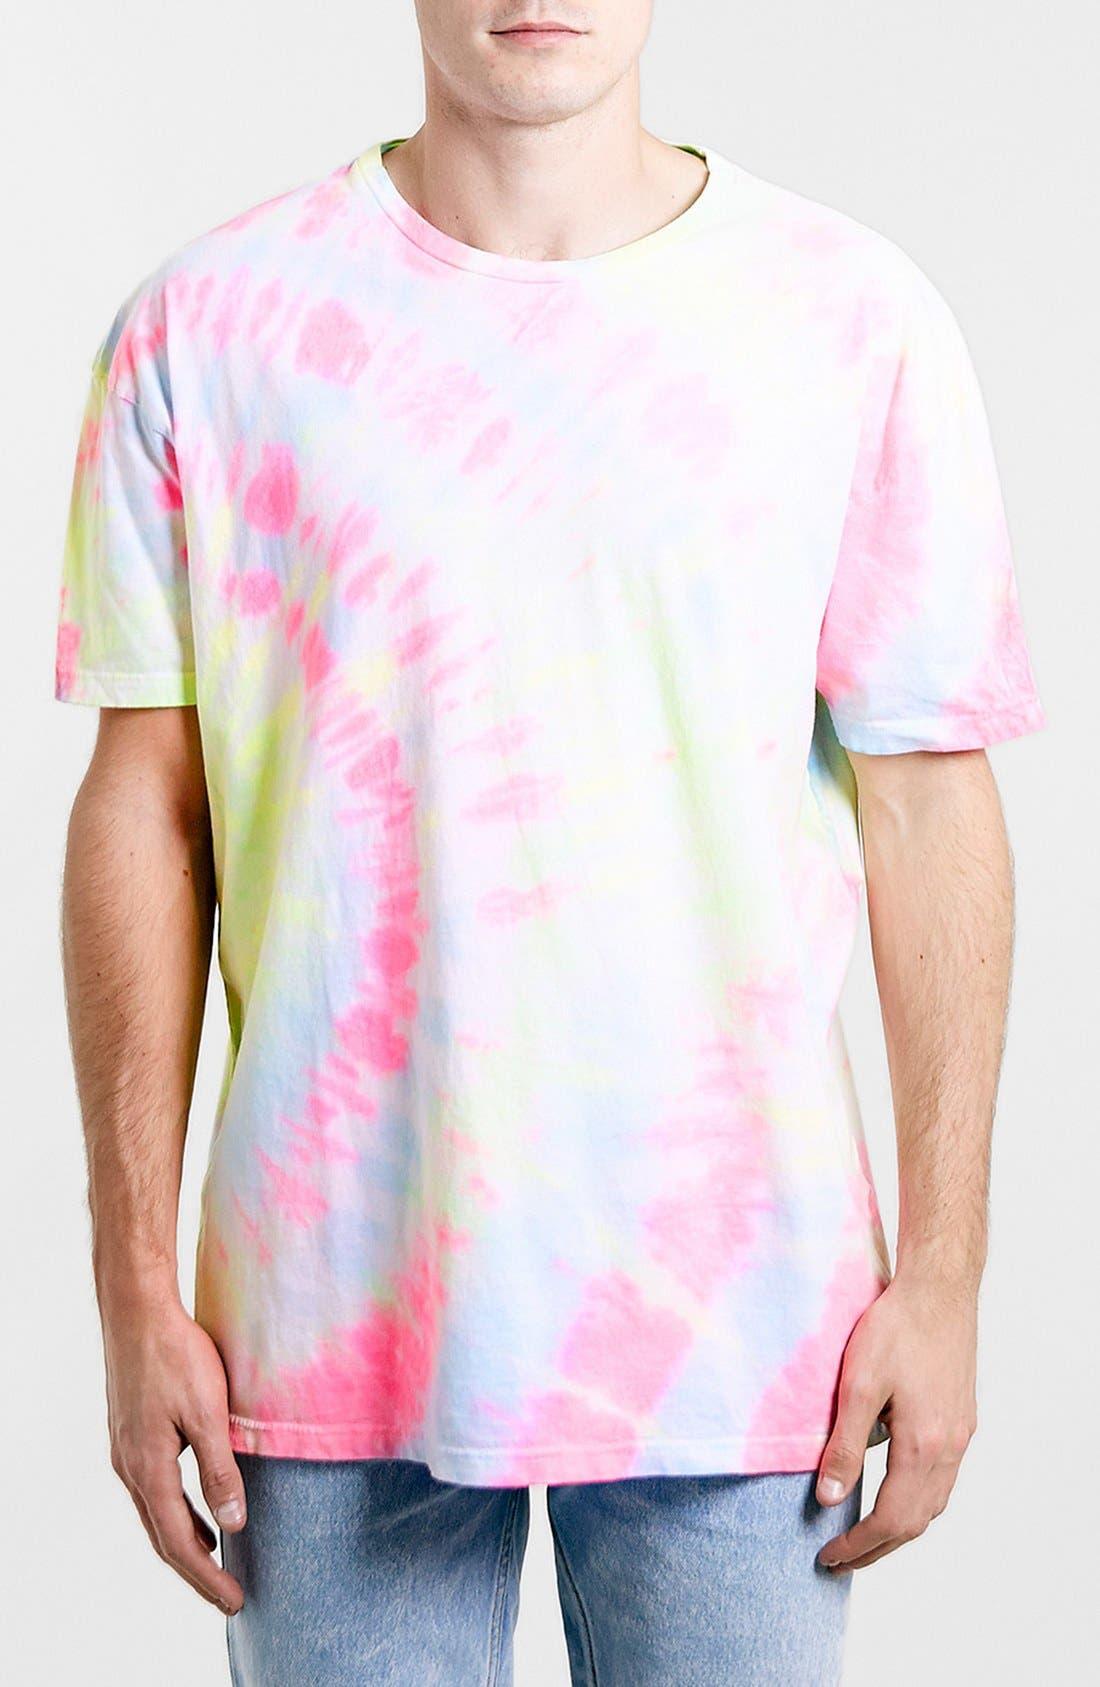 Main Image - Topman 'Skater Cali' Oversized Neon Tie-Dye Cotton T-Shirt